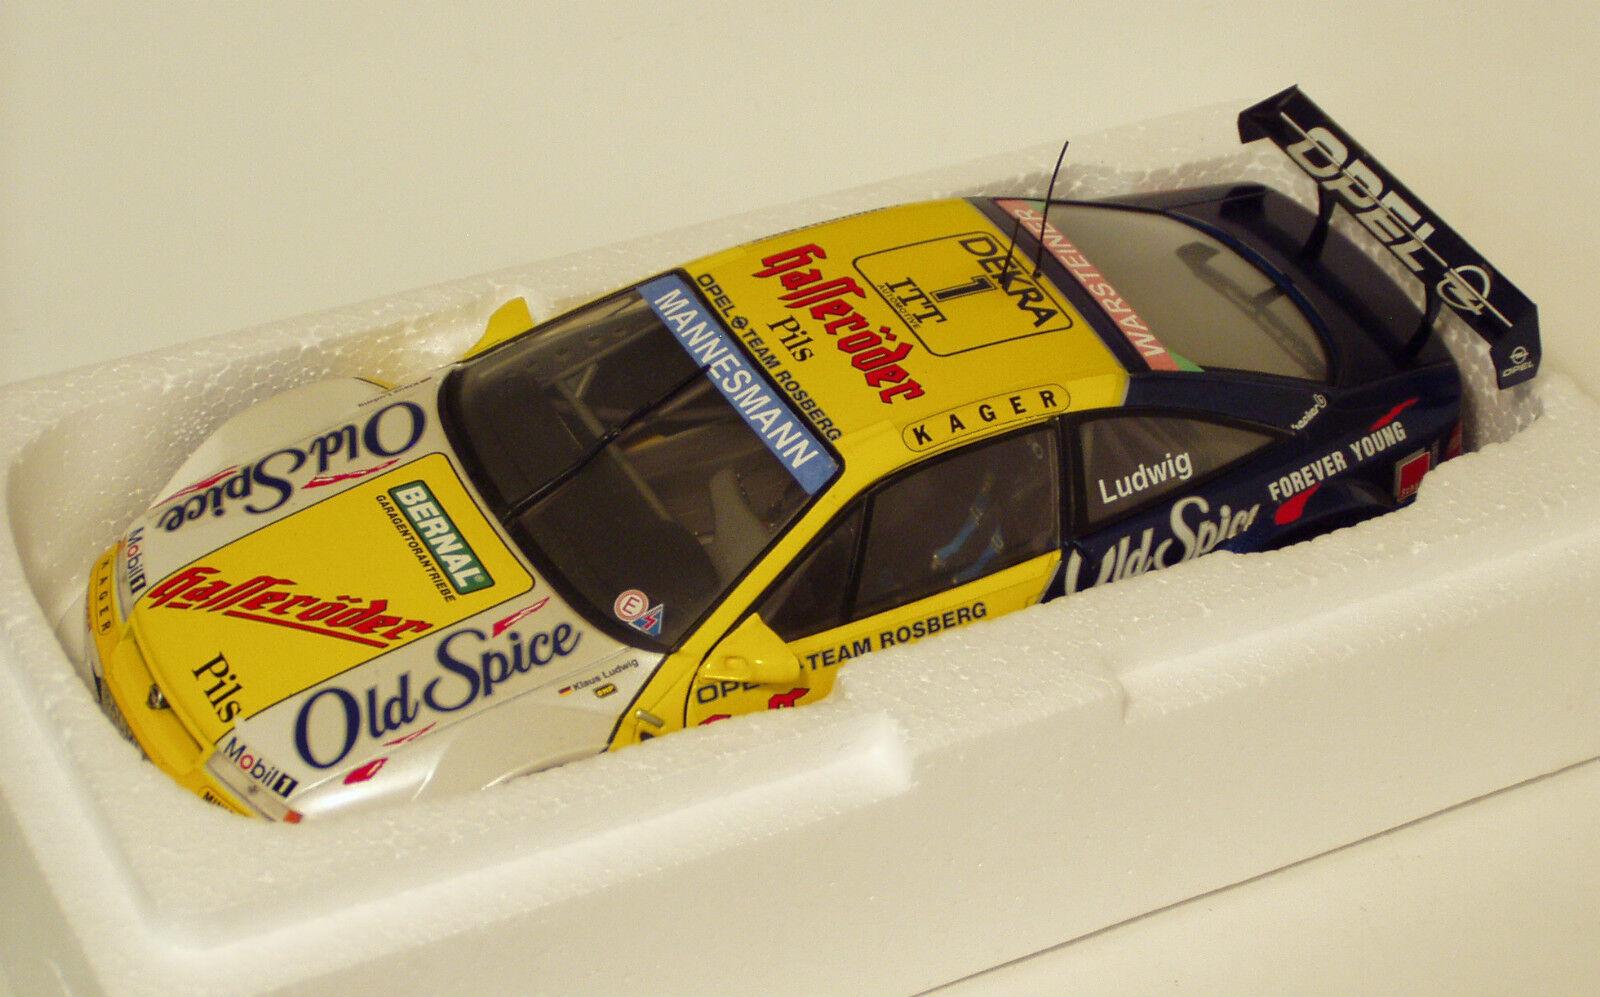 1 18 Opel Calibra Old Spice   Opel Team Rosberg  1995 DTM  K.Ludwig